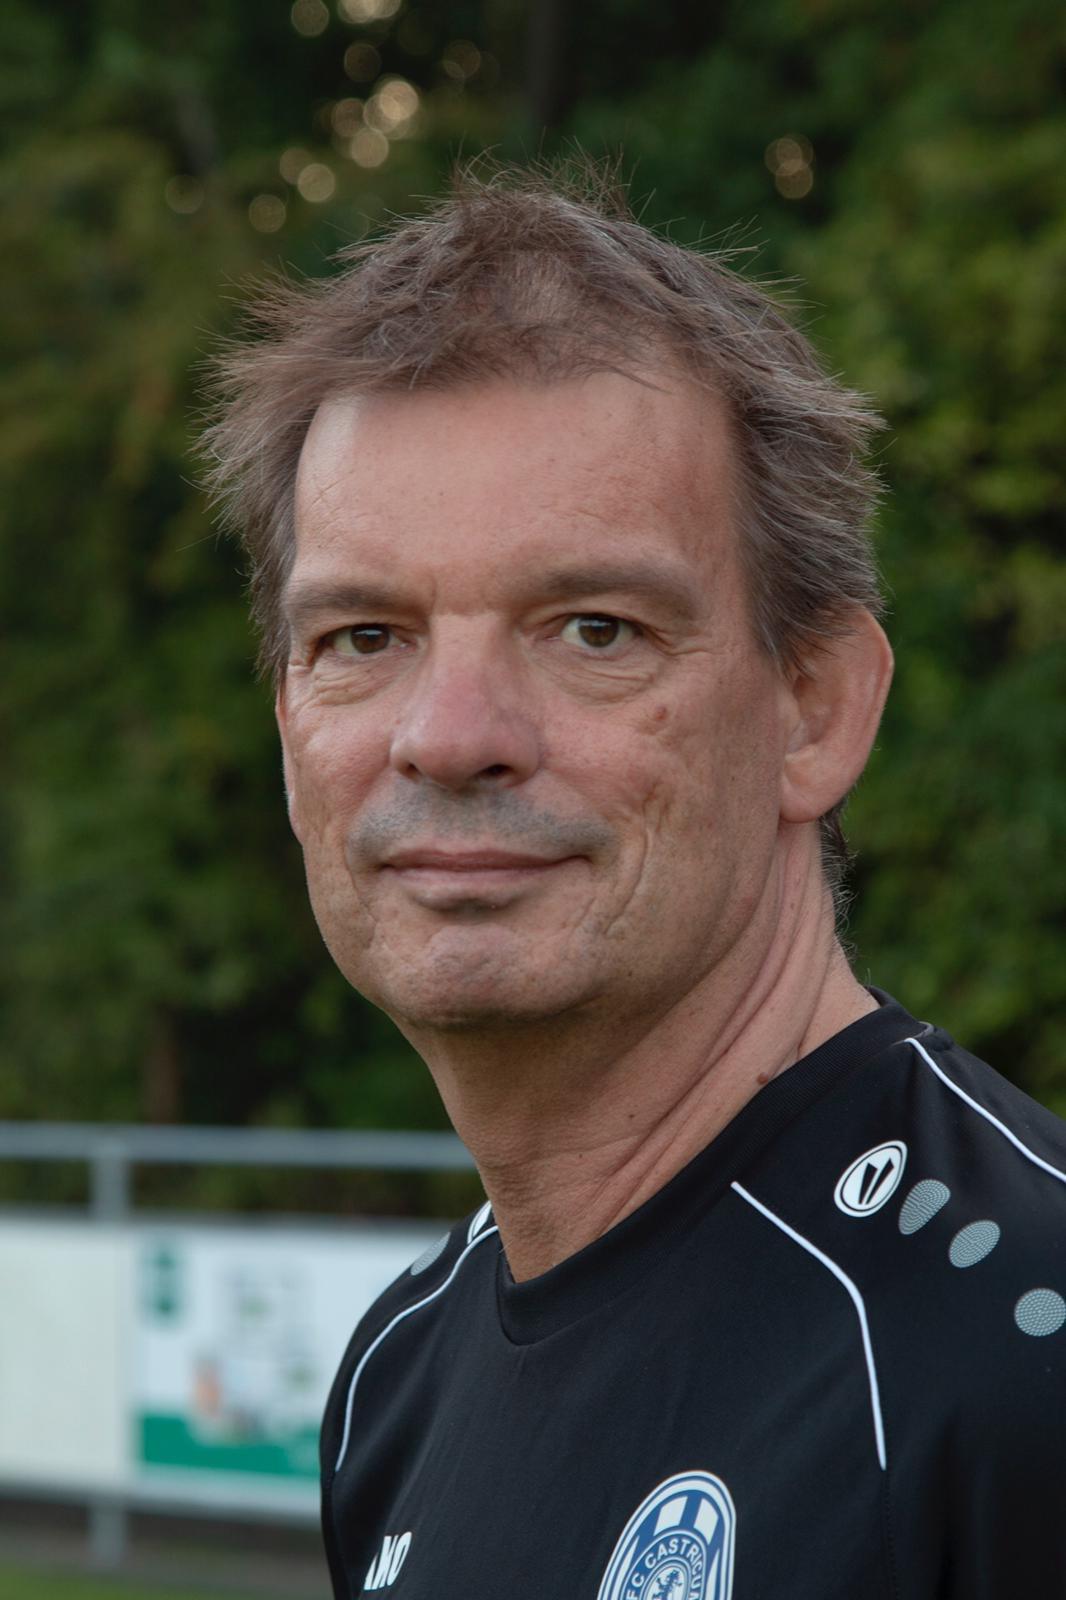 Willem Zeijlmans